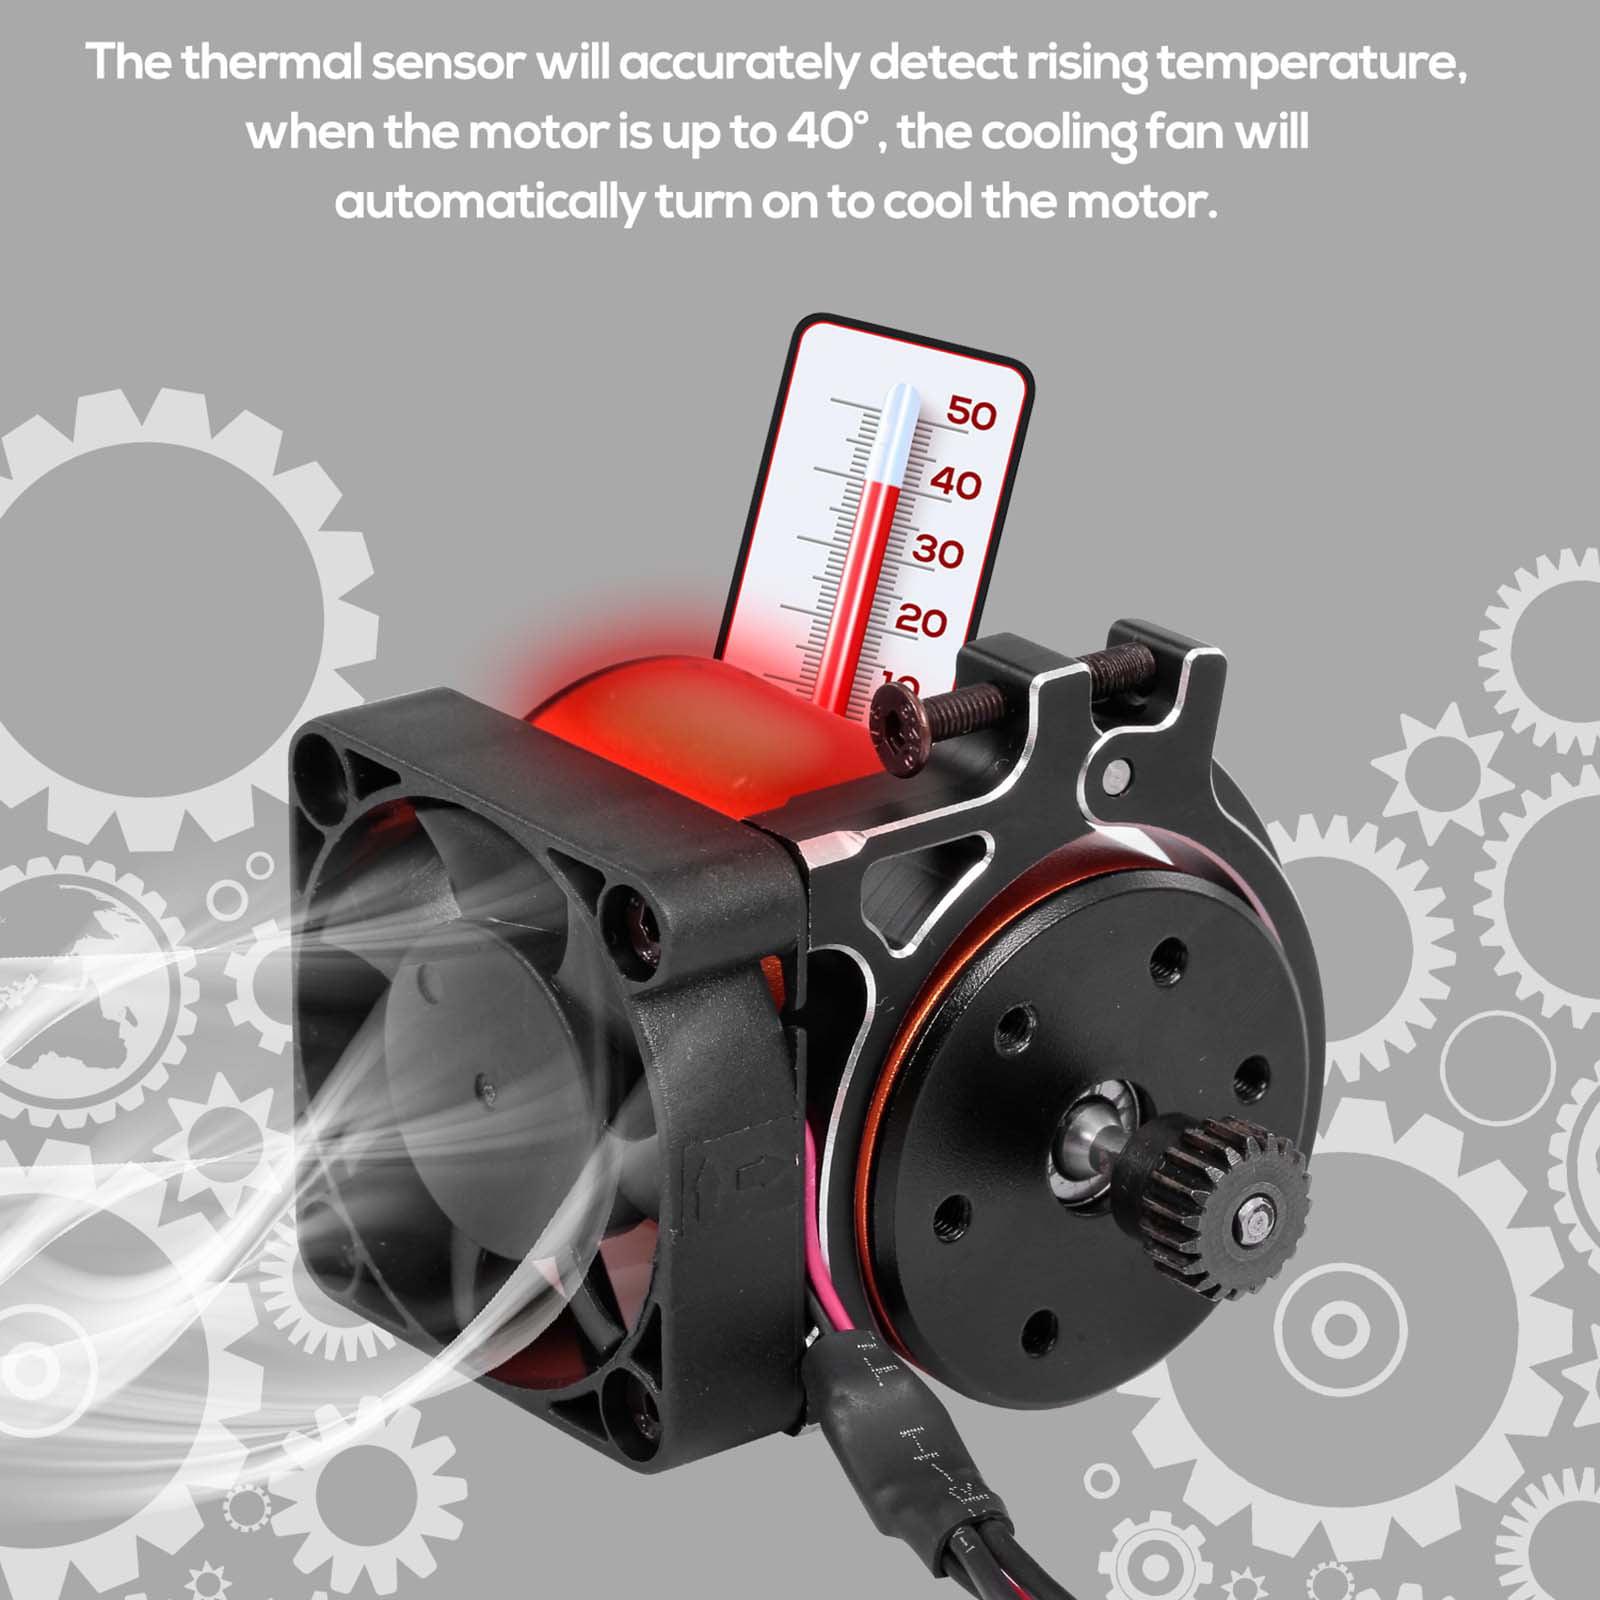 Black GoolRC RC Car Motor Heatsink Cooling Fan with Thermal Sensor CNC Aluminum Alloy Clamp Heatsink for 4268 4274 Motors 1//8 1//10 Buggy Cars